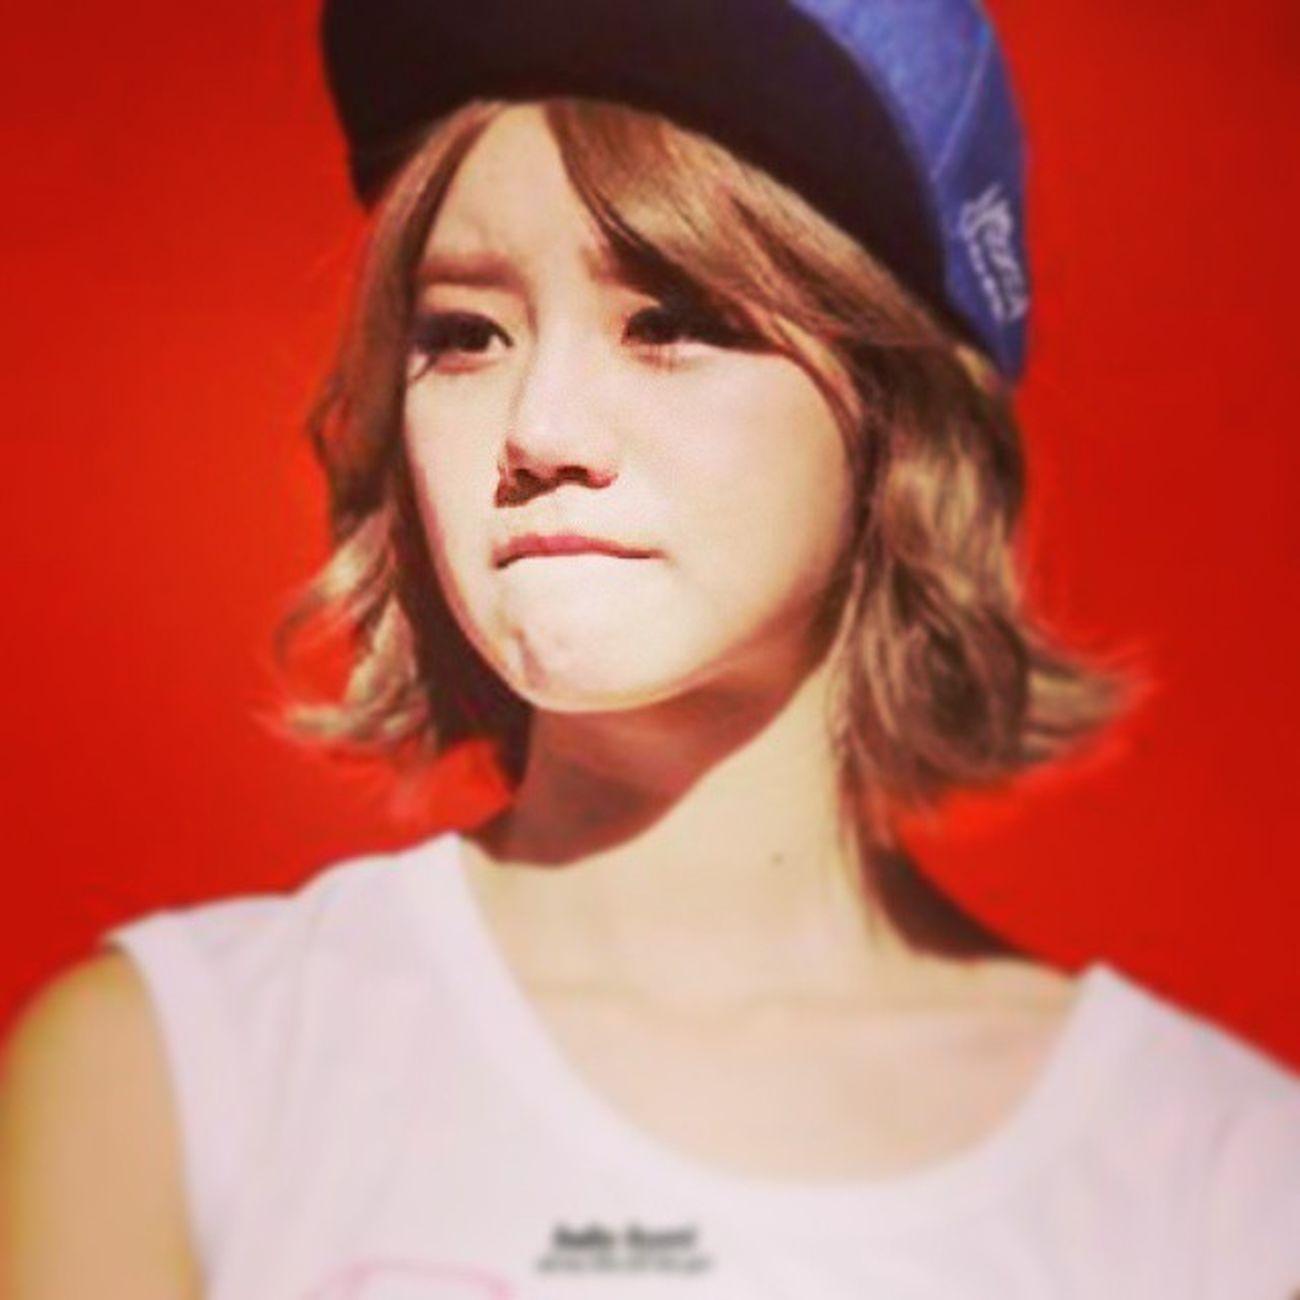 Lee Hyeri Leehyeri طييب لاتبكونهاا احبهاا 😢💔💘